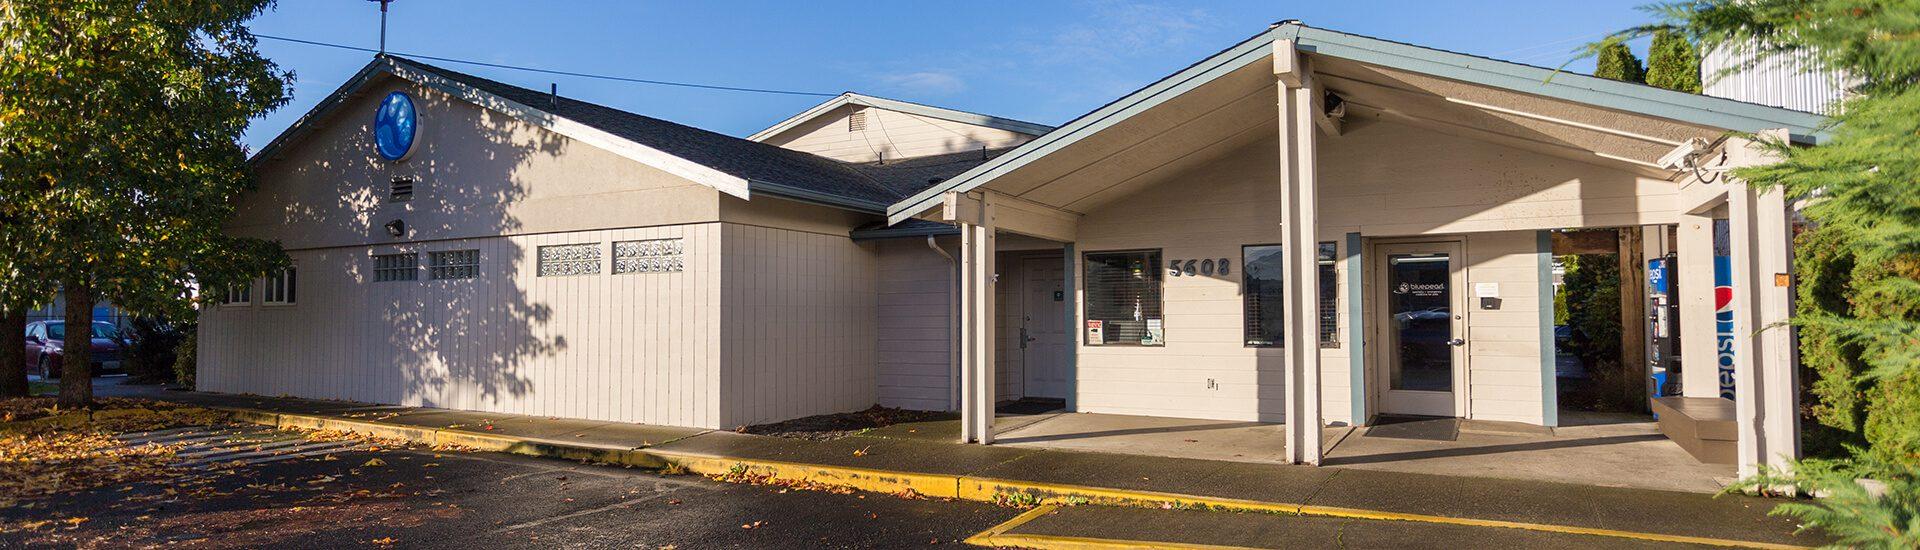 bluepearl pet hospital tacoma wa emergency vet. Black Bedroom Furniture Sets. Home Design Ideas